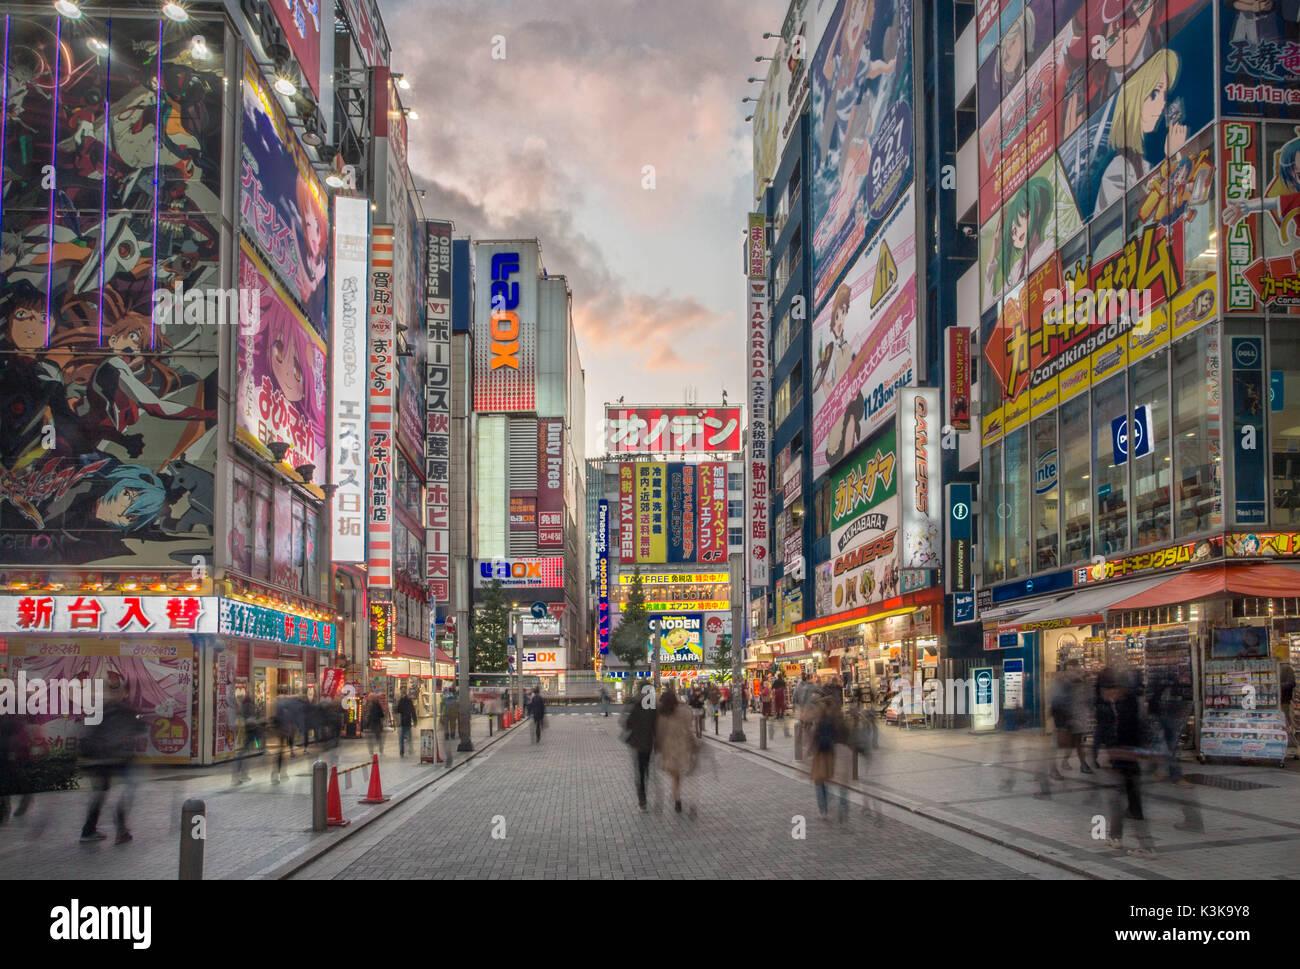 Japan, Tokyo City, Akihabara Electric Town - Stock Image